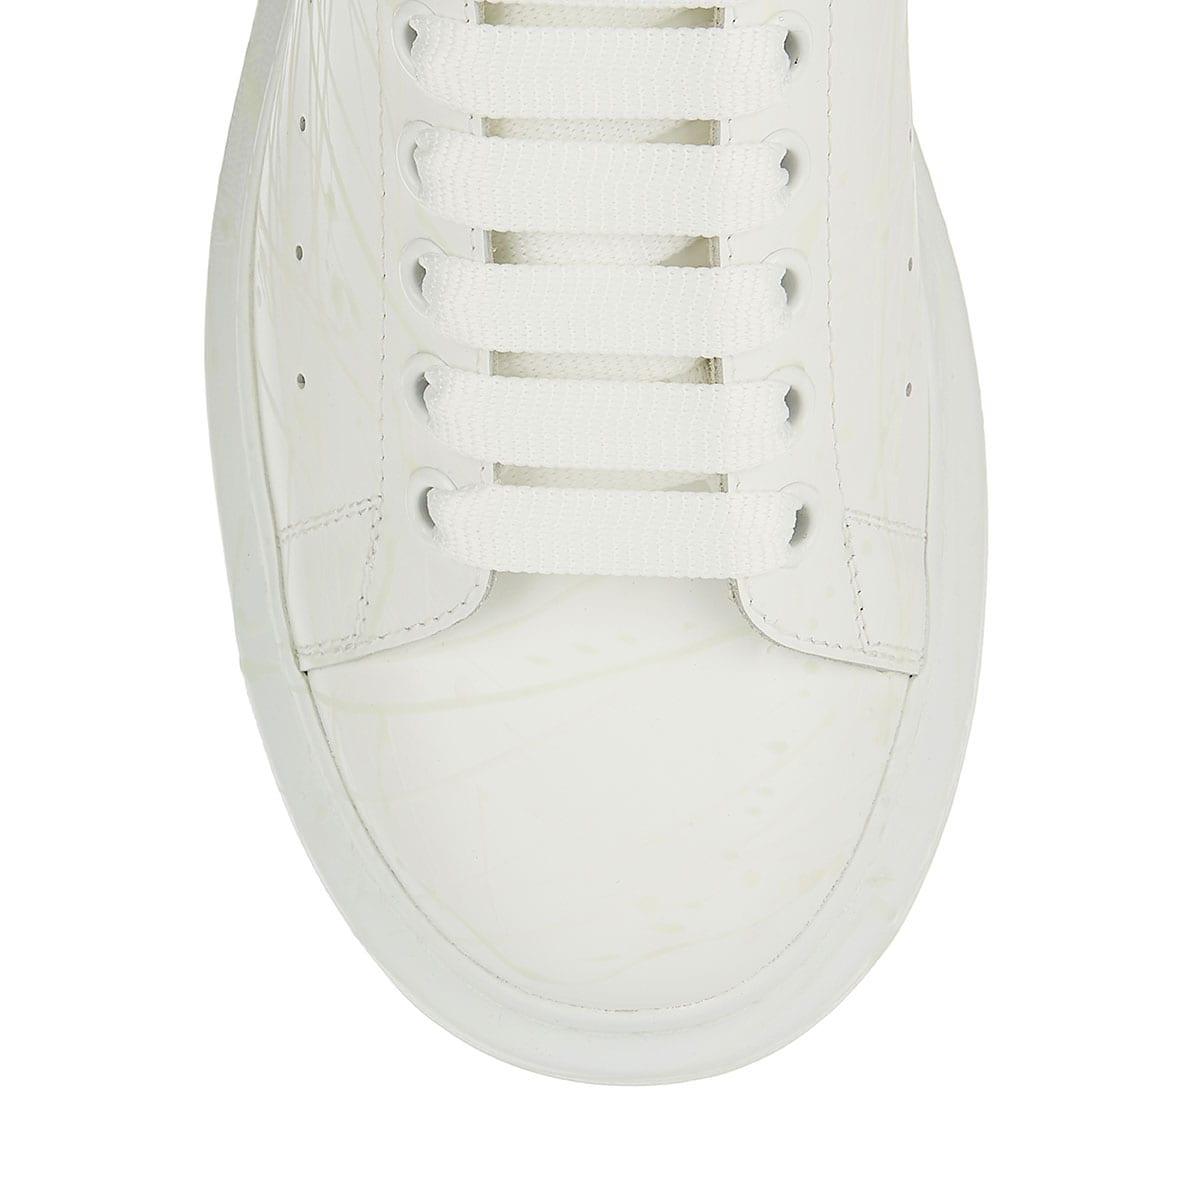 Glow in the dark oversized sneakers